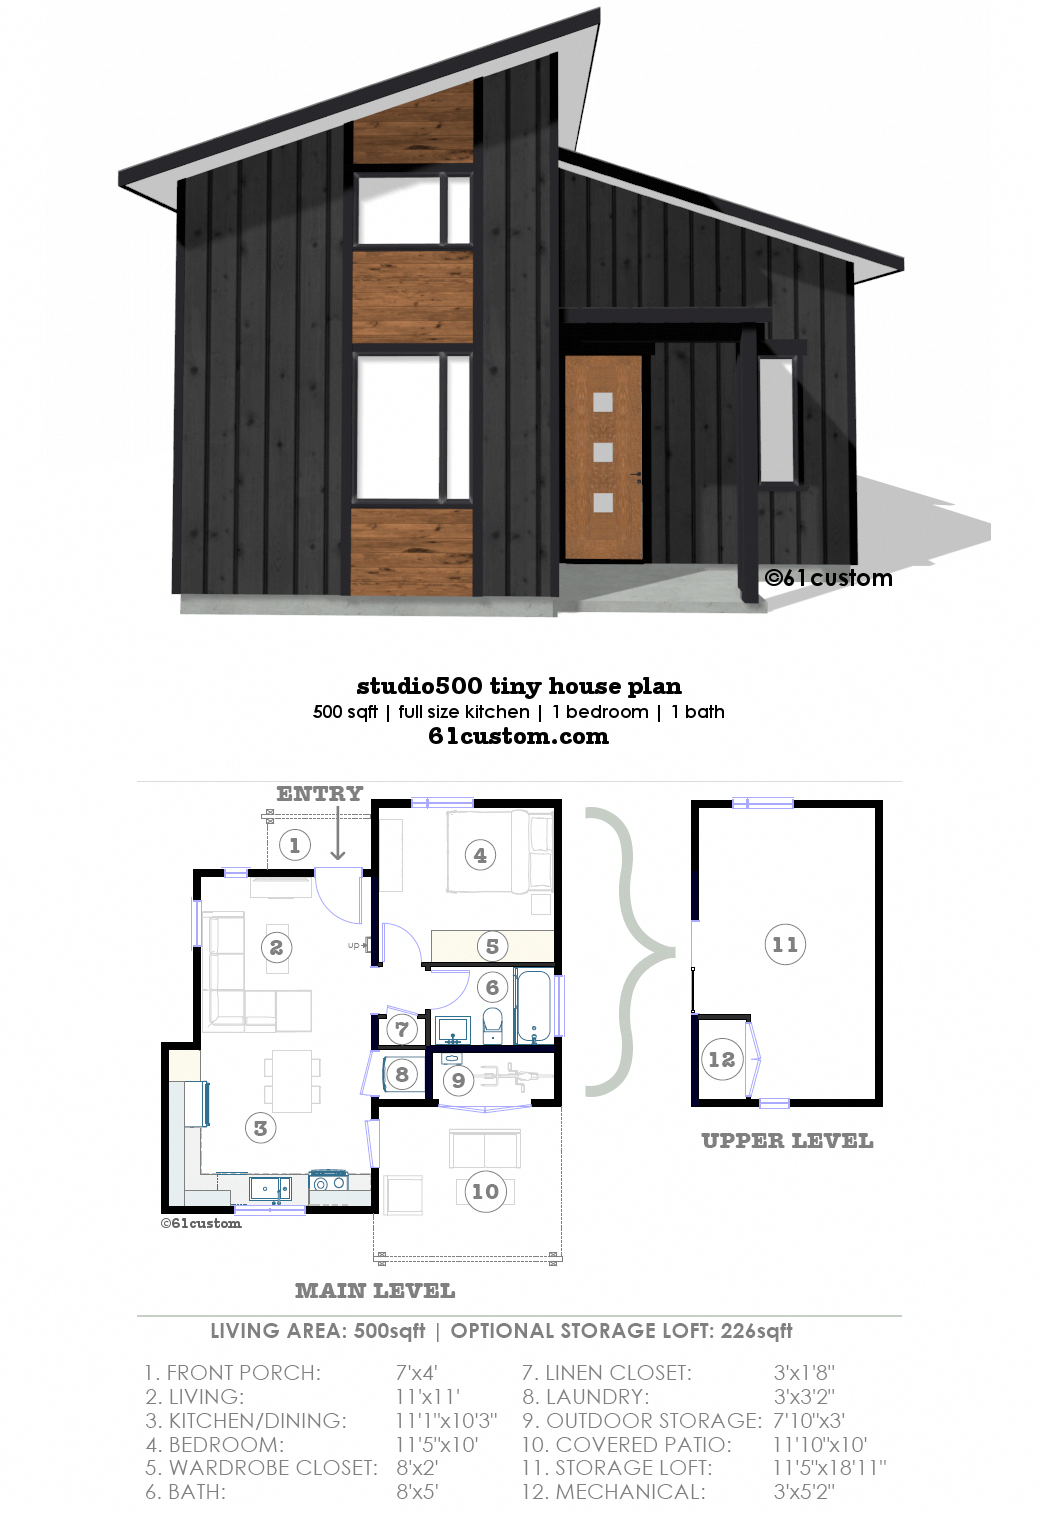 Studio500 Modern Tiny House Plan 61custom One Bedroom House Plans Modern Tiny House Tiny House Plan